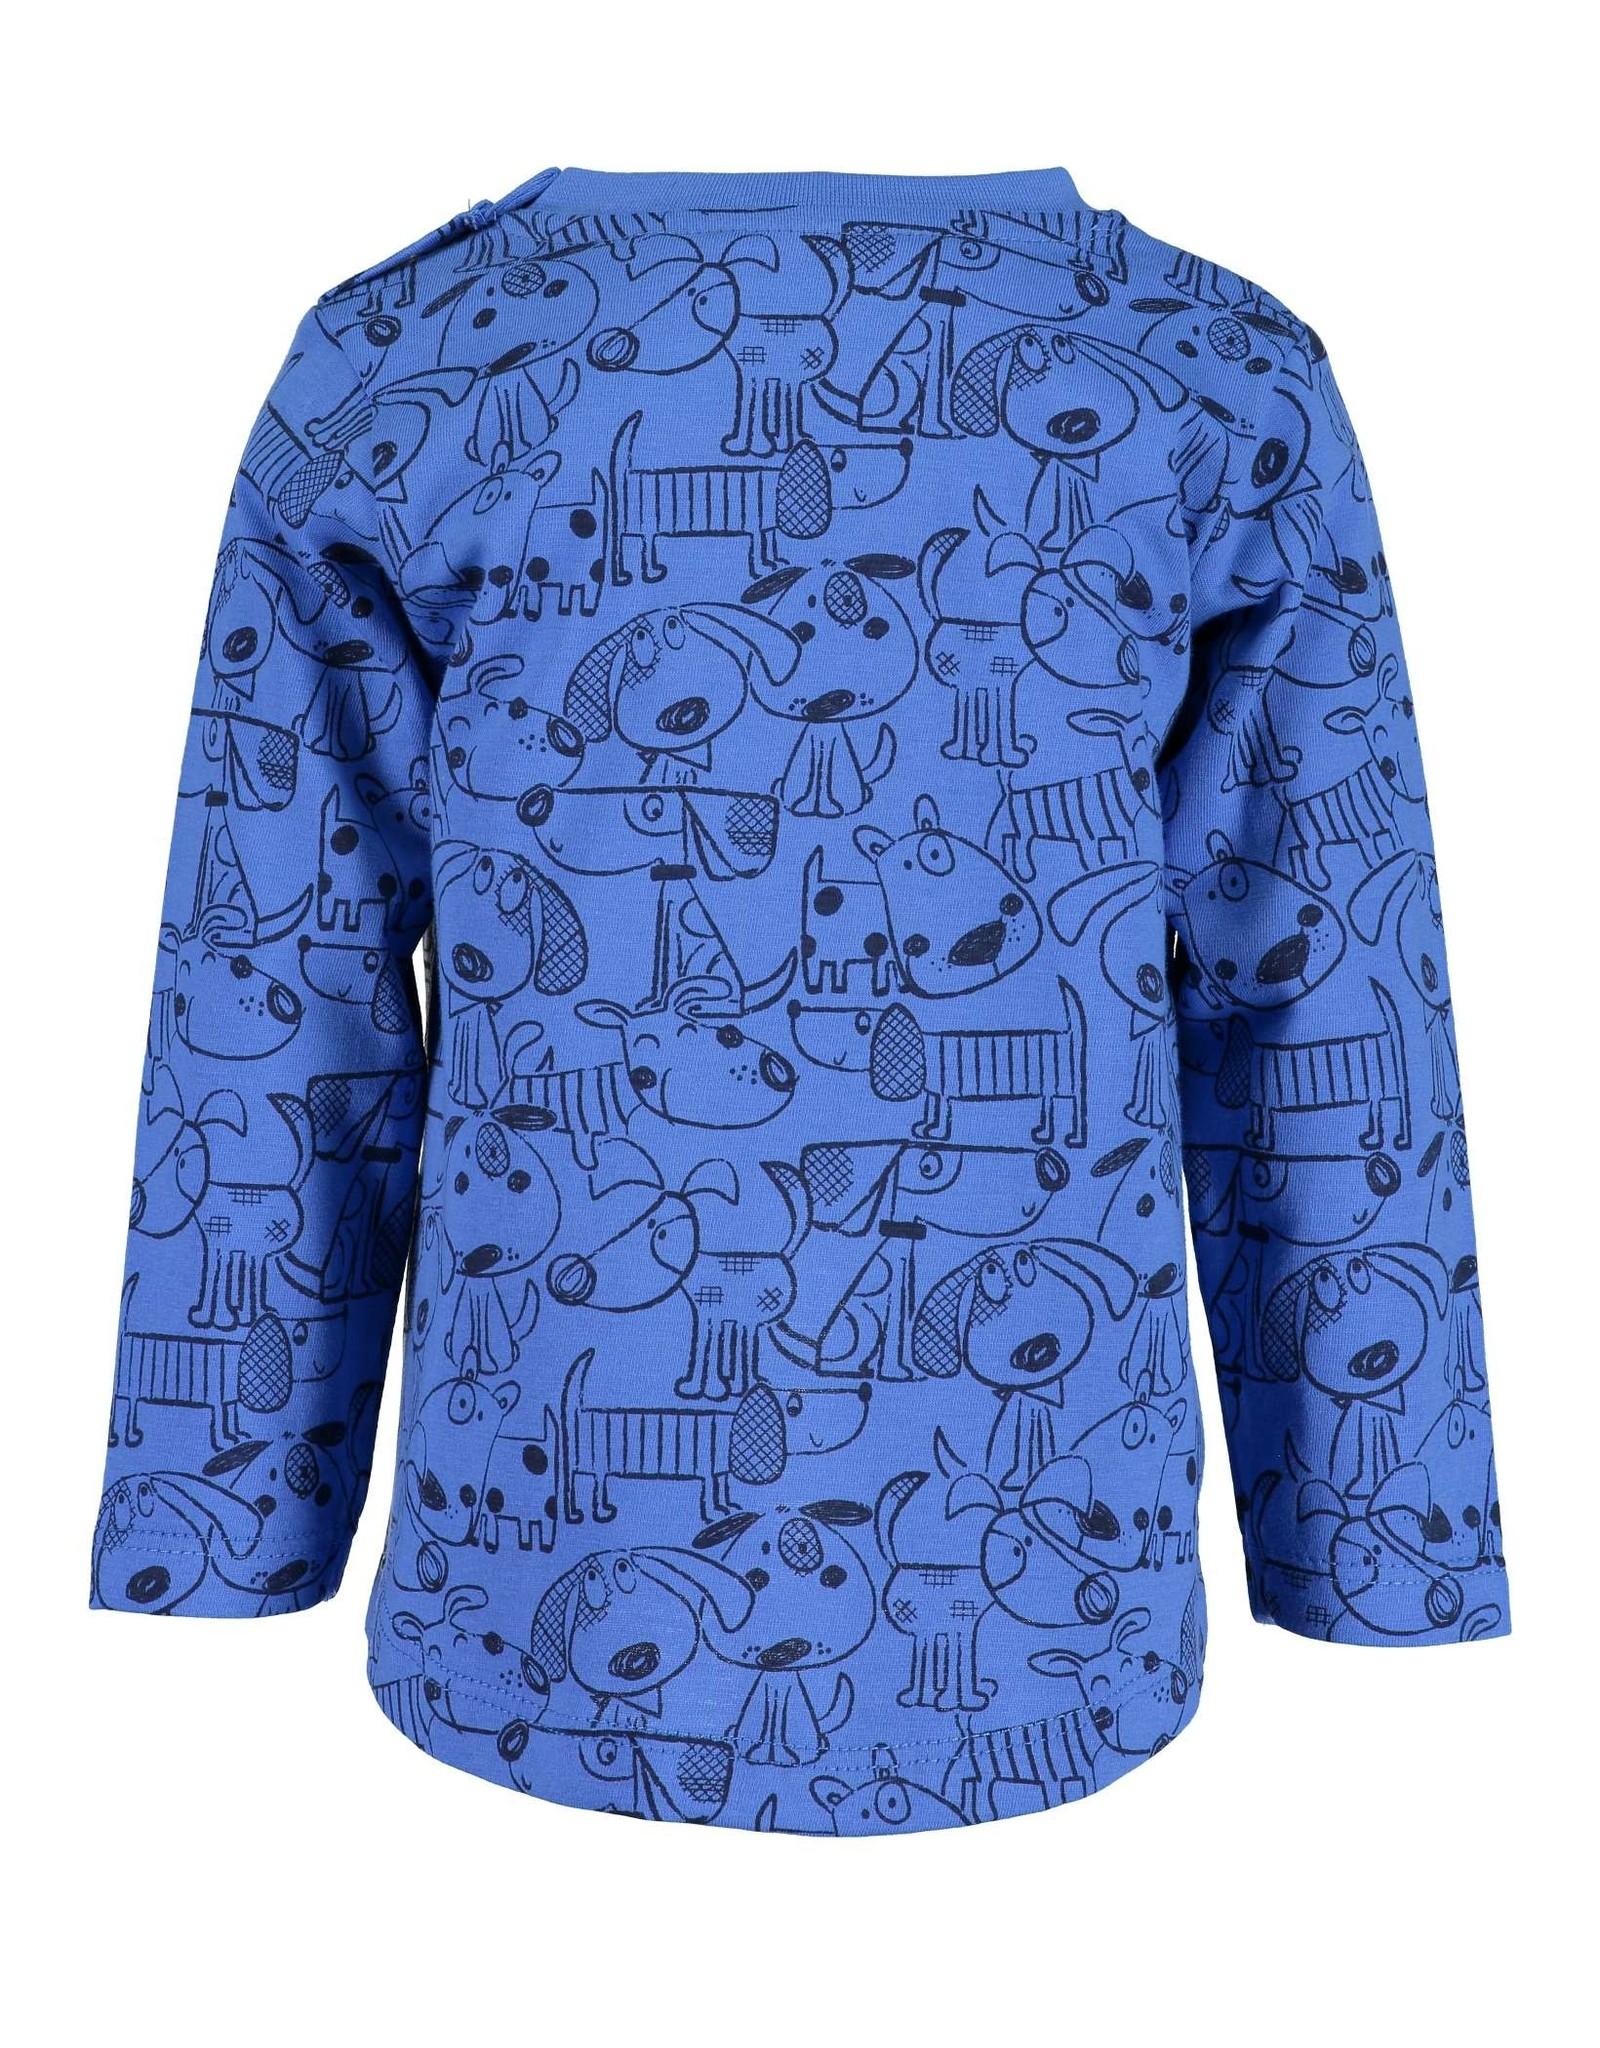 Blue Seven Blue Seven baby jongens shirt HAPPY DOGS